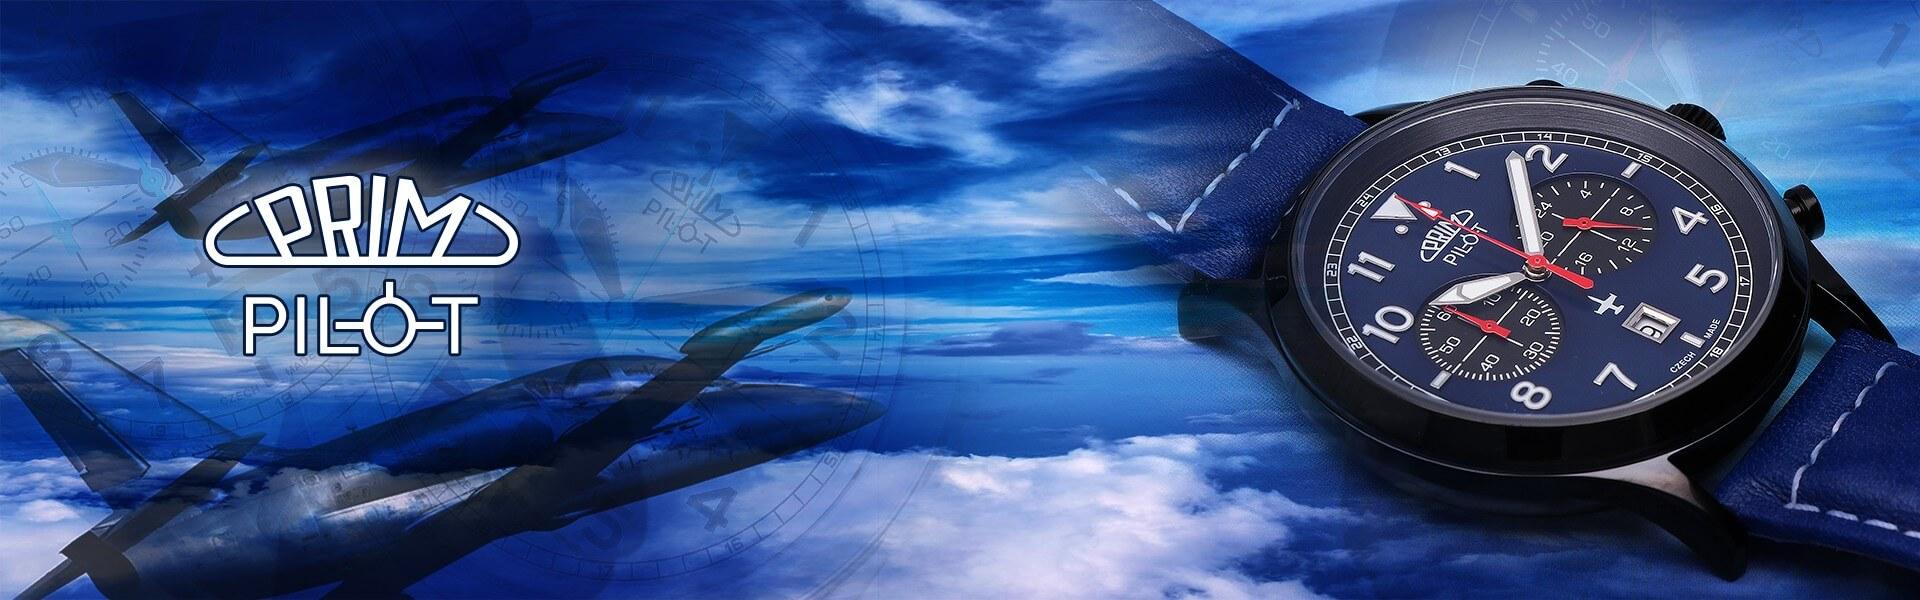 PILOT 20019_blue_1920x600-2